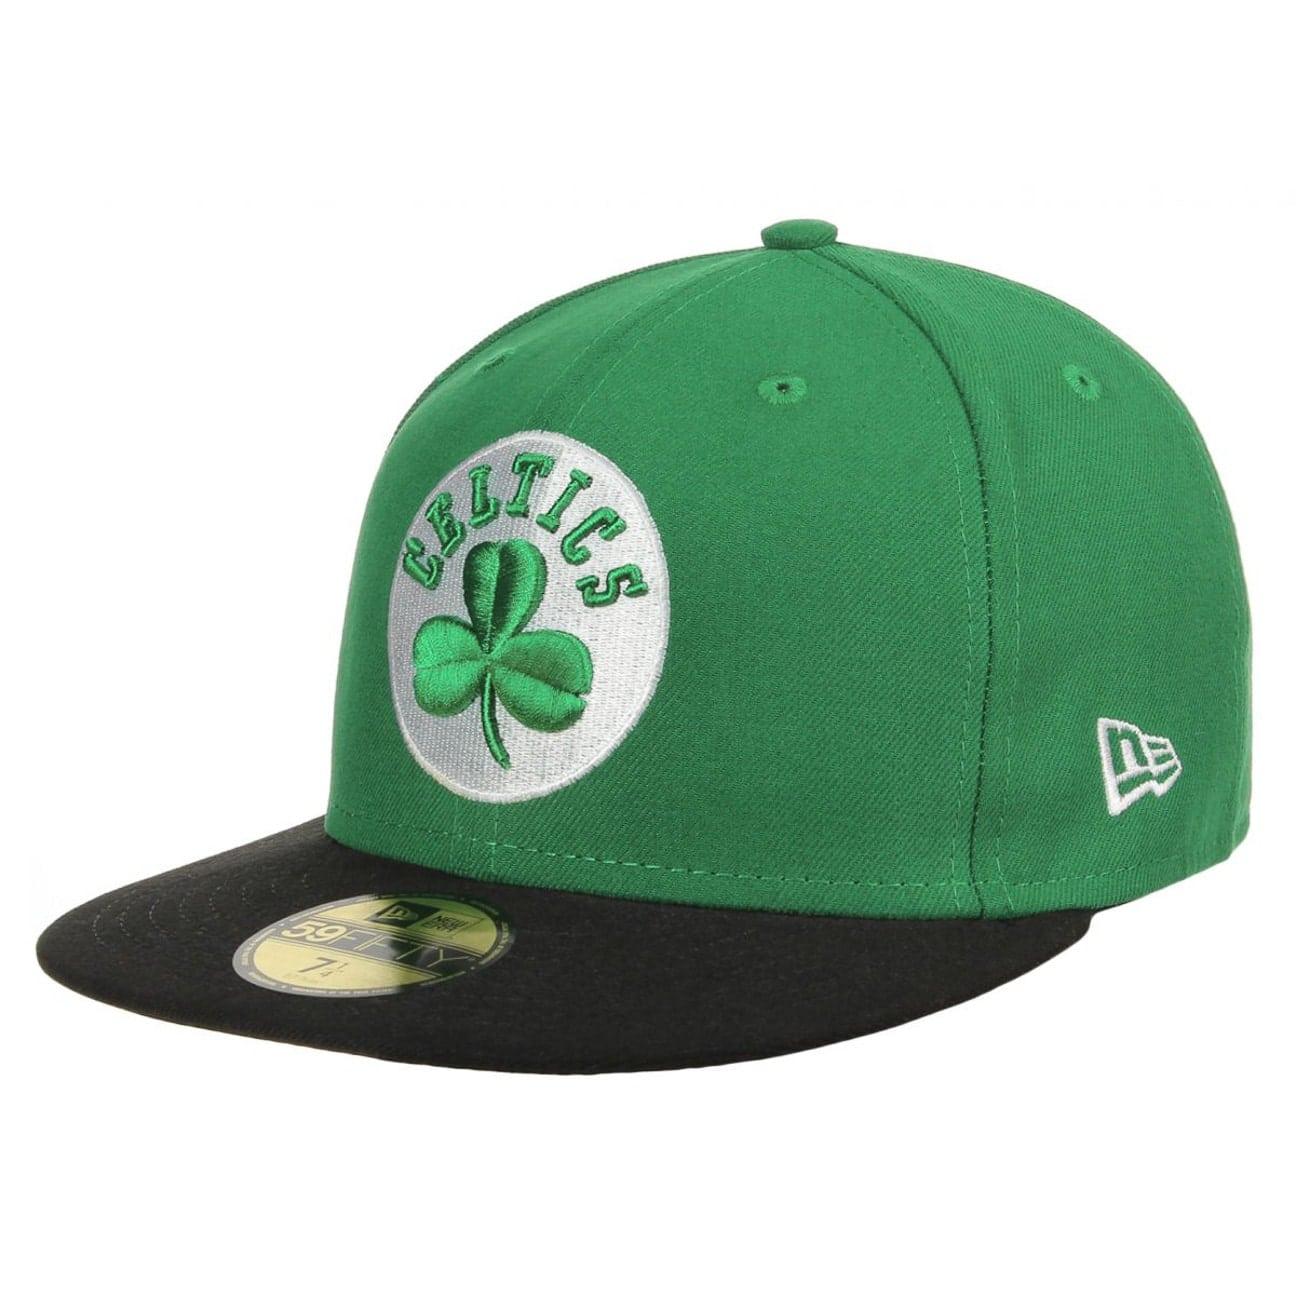 59fifty boston celtics cap by new era eur 24 95 hats caps beanies shop online. Black Bedroom Furniture Sets. Home Design Ideas